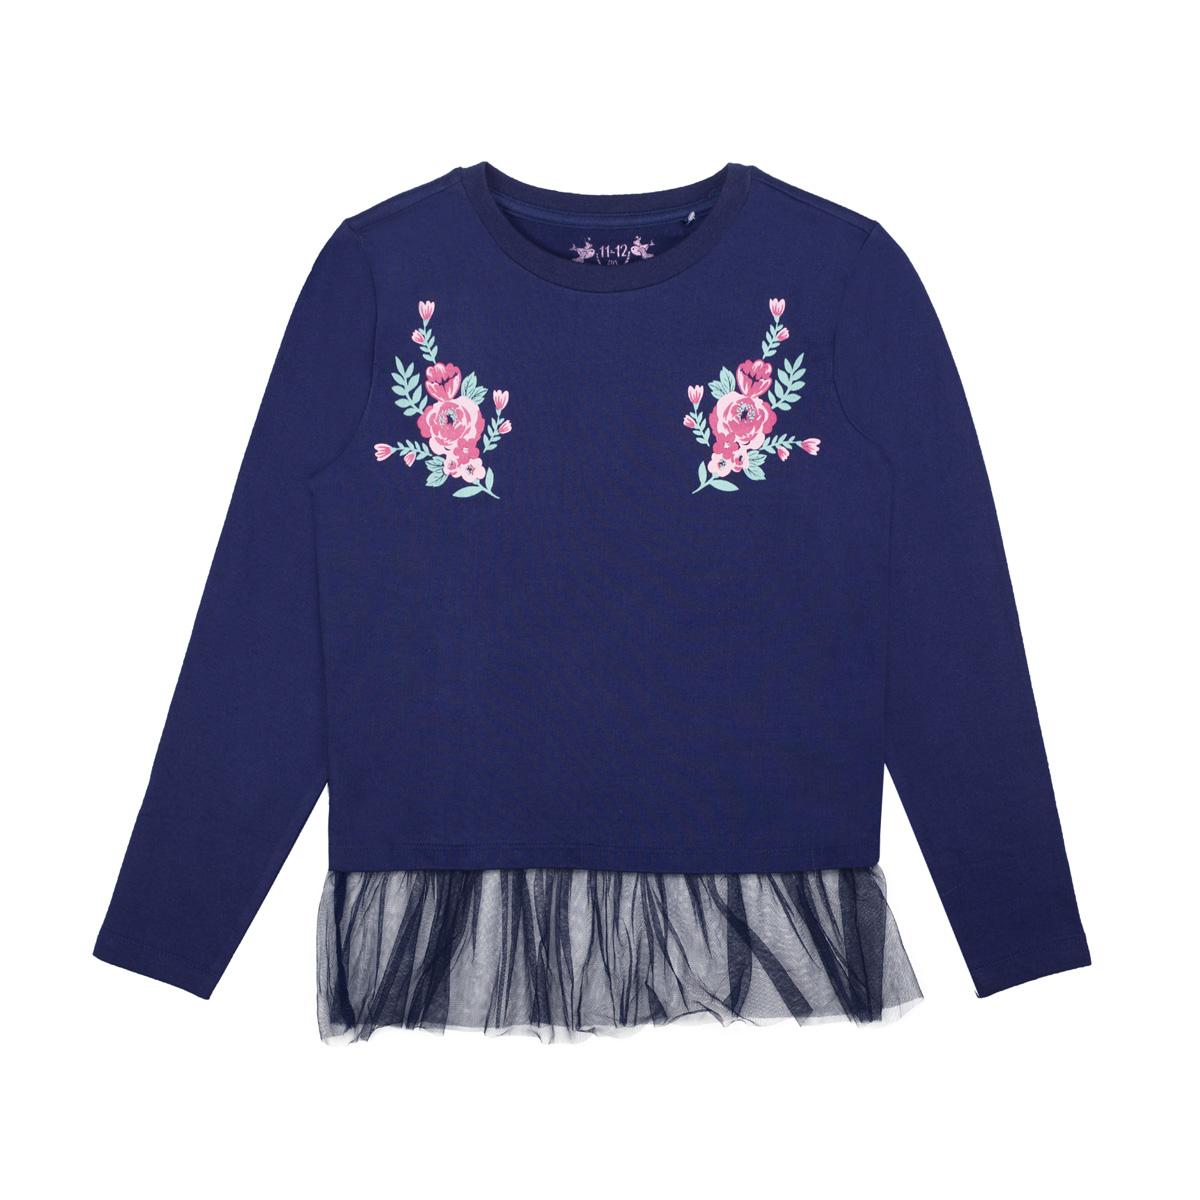 Dekliški pulover, temno modra